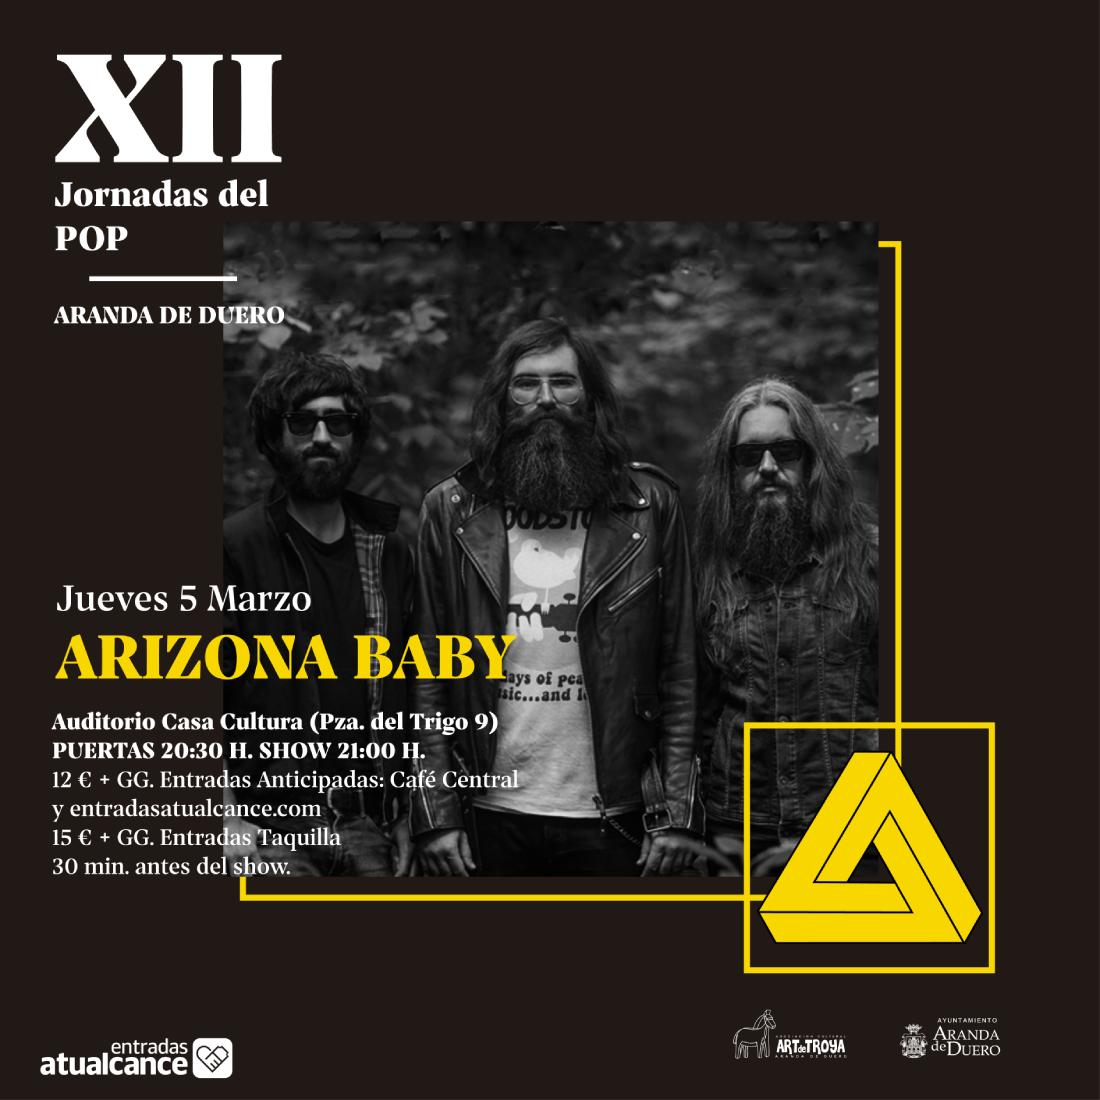 arizona-baby-en-aranda-de-duero-jornadas-del-pop-2020-5e2aeaf06e4a8.jpeg